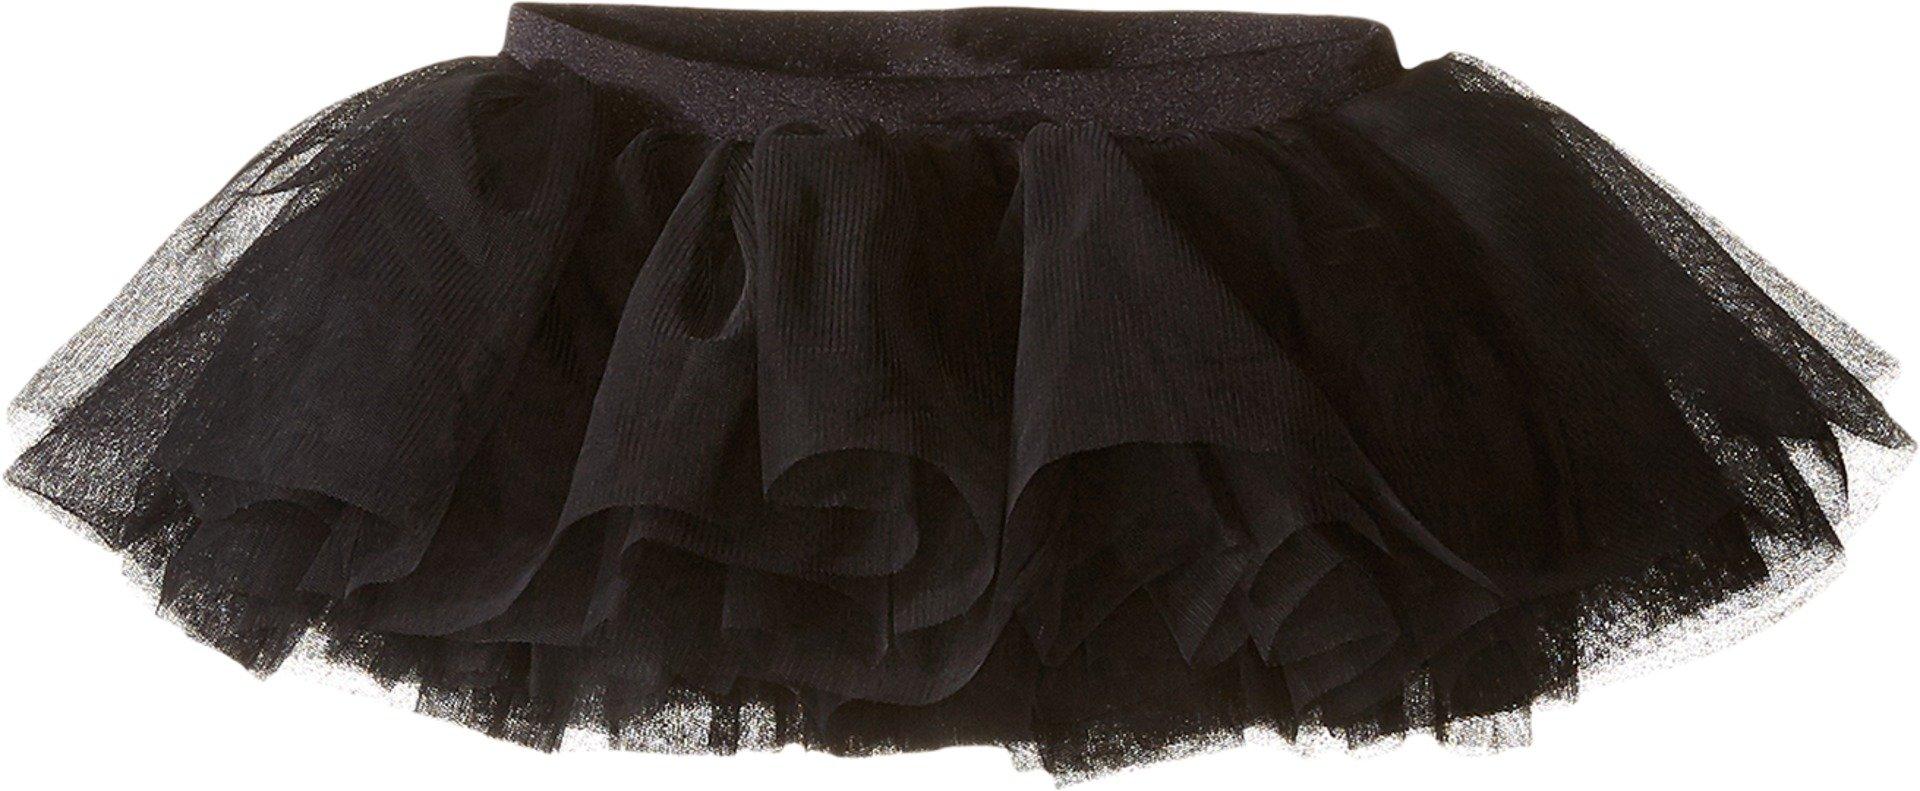 Bloch Toddler Hurley Tutu, Black-2/4T by Bloch